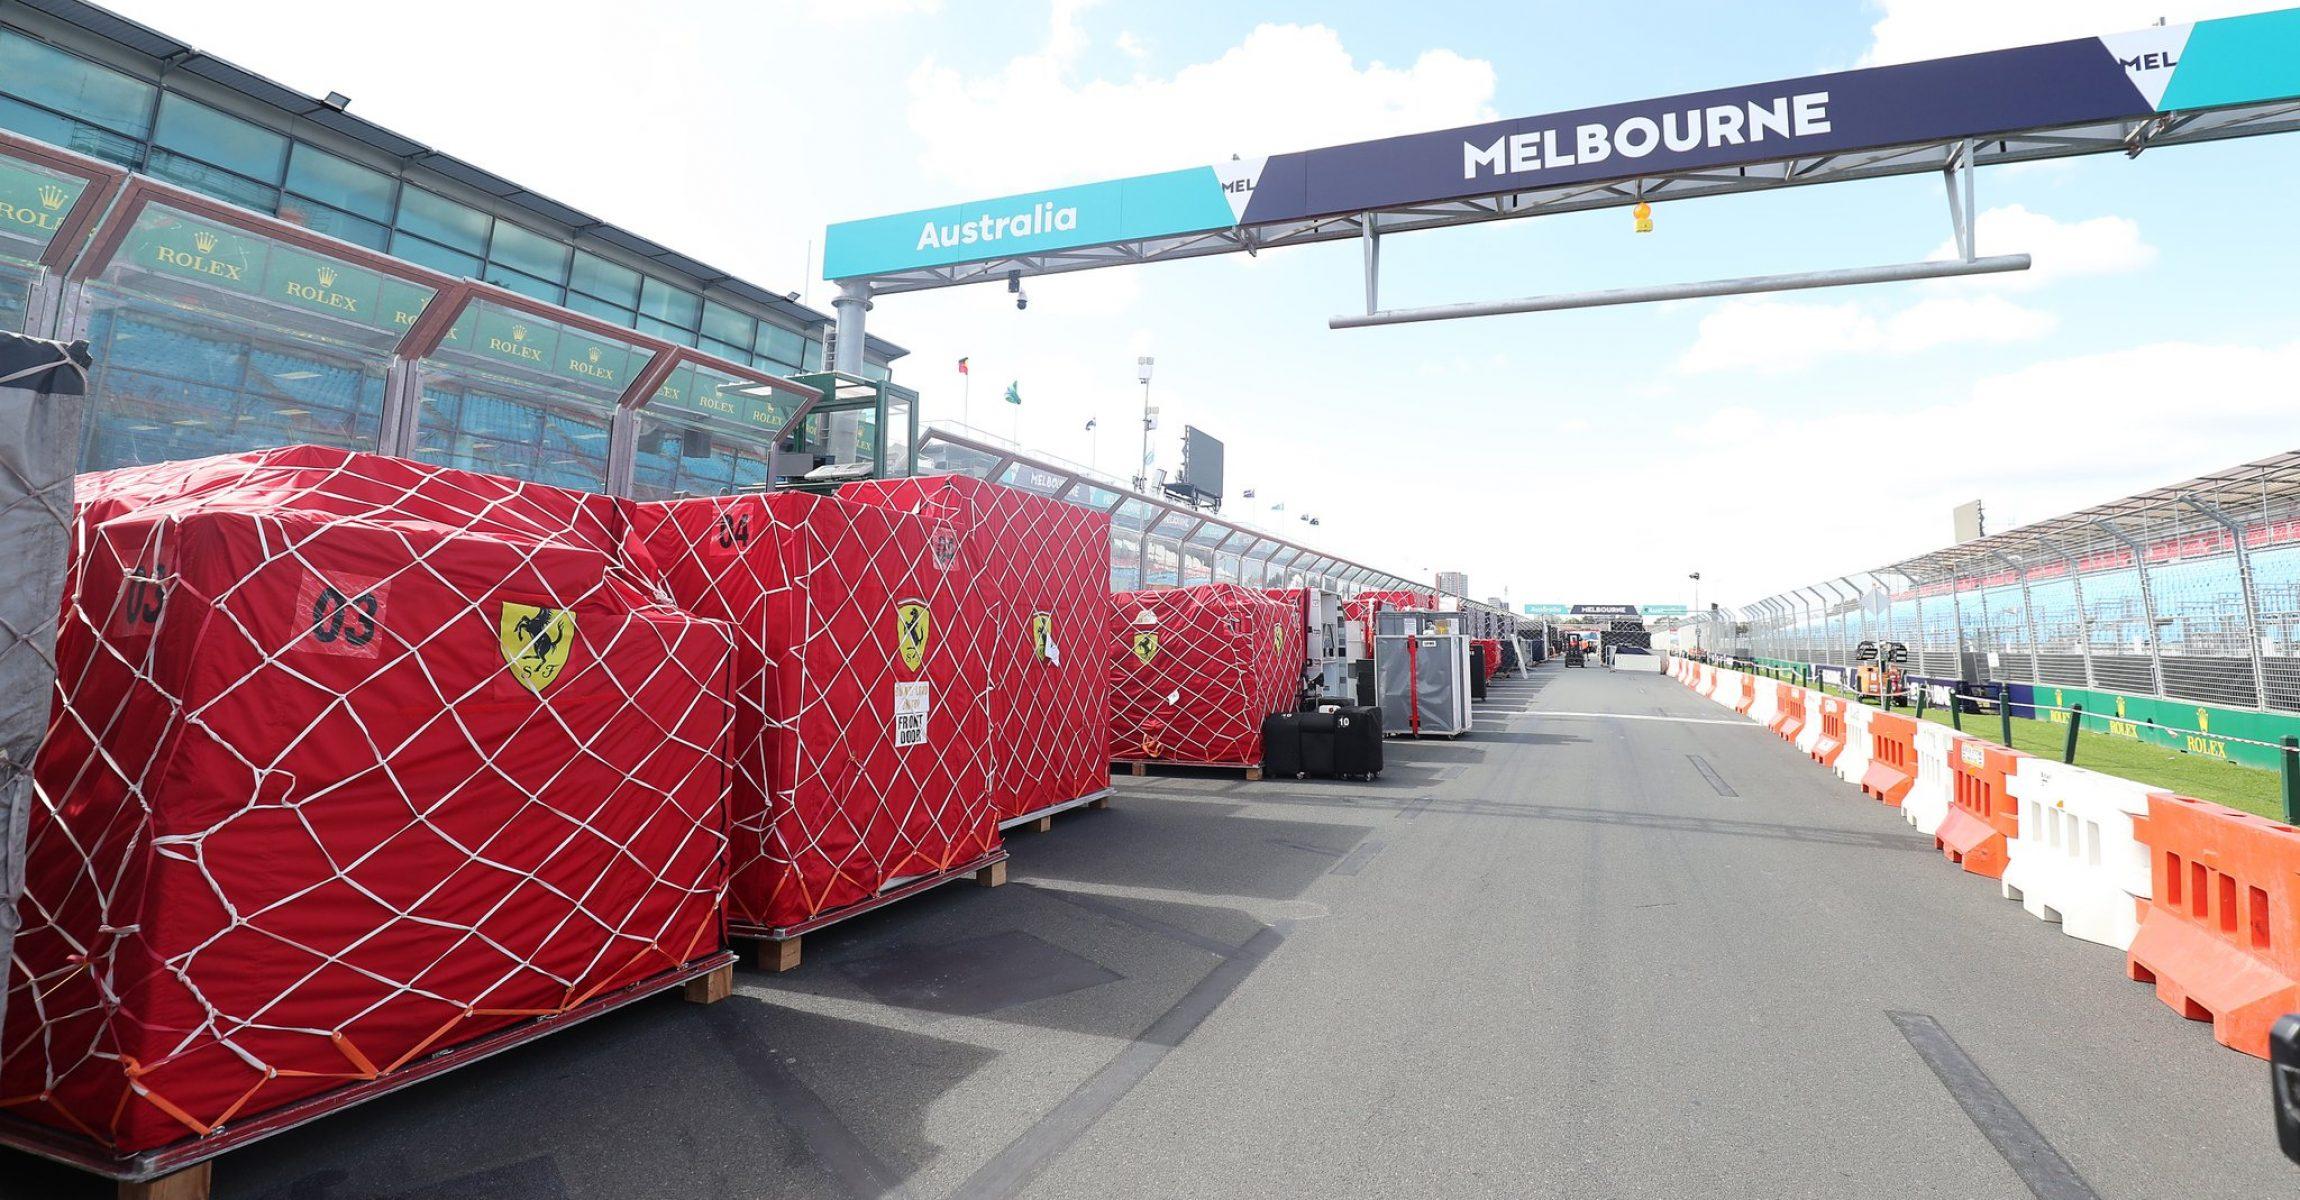 F1 freights Ferrari Melbourne